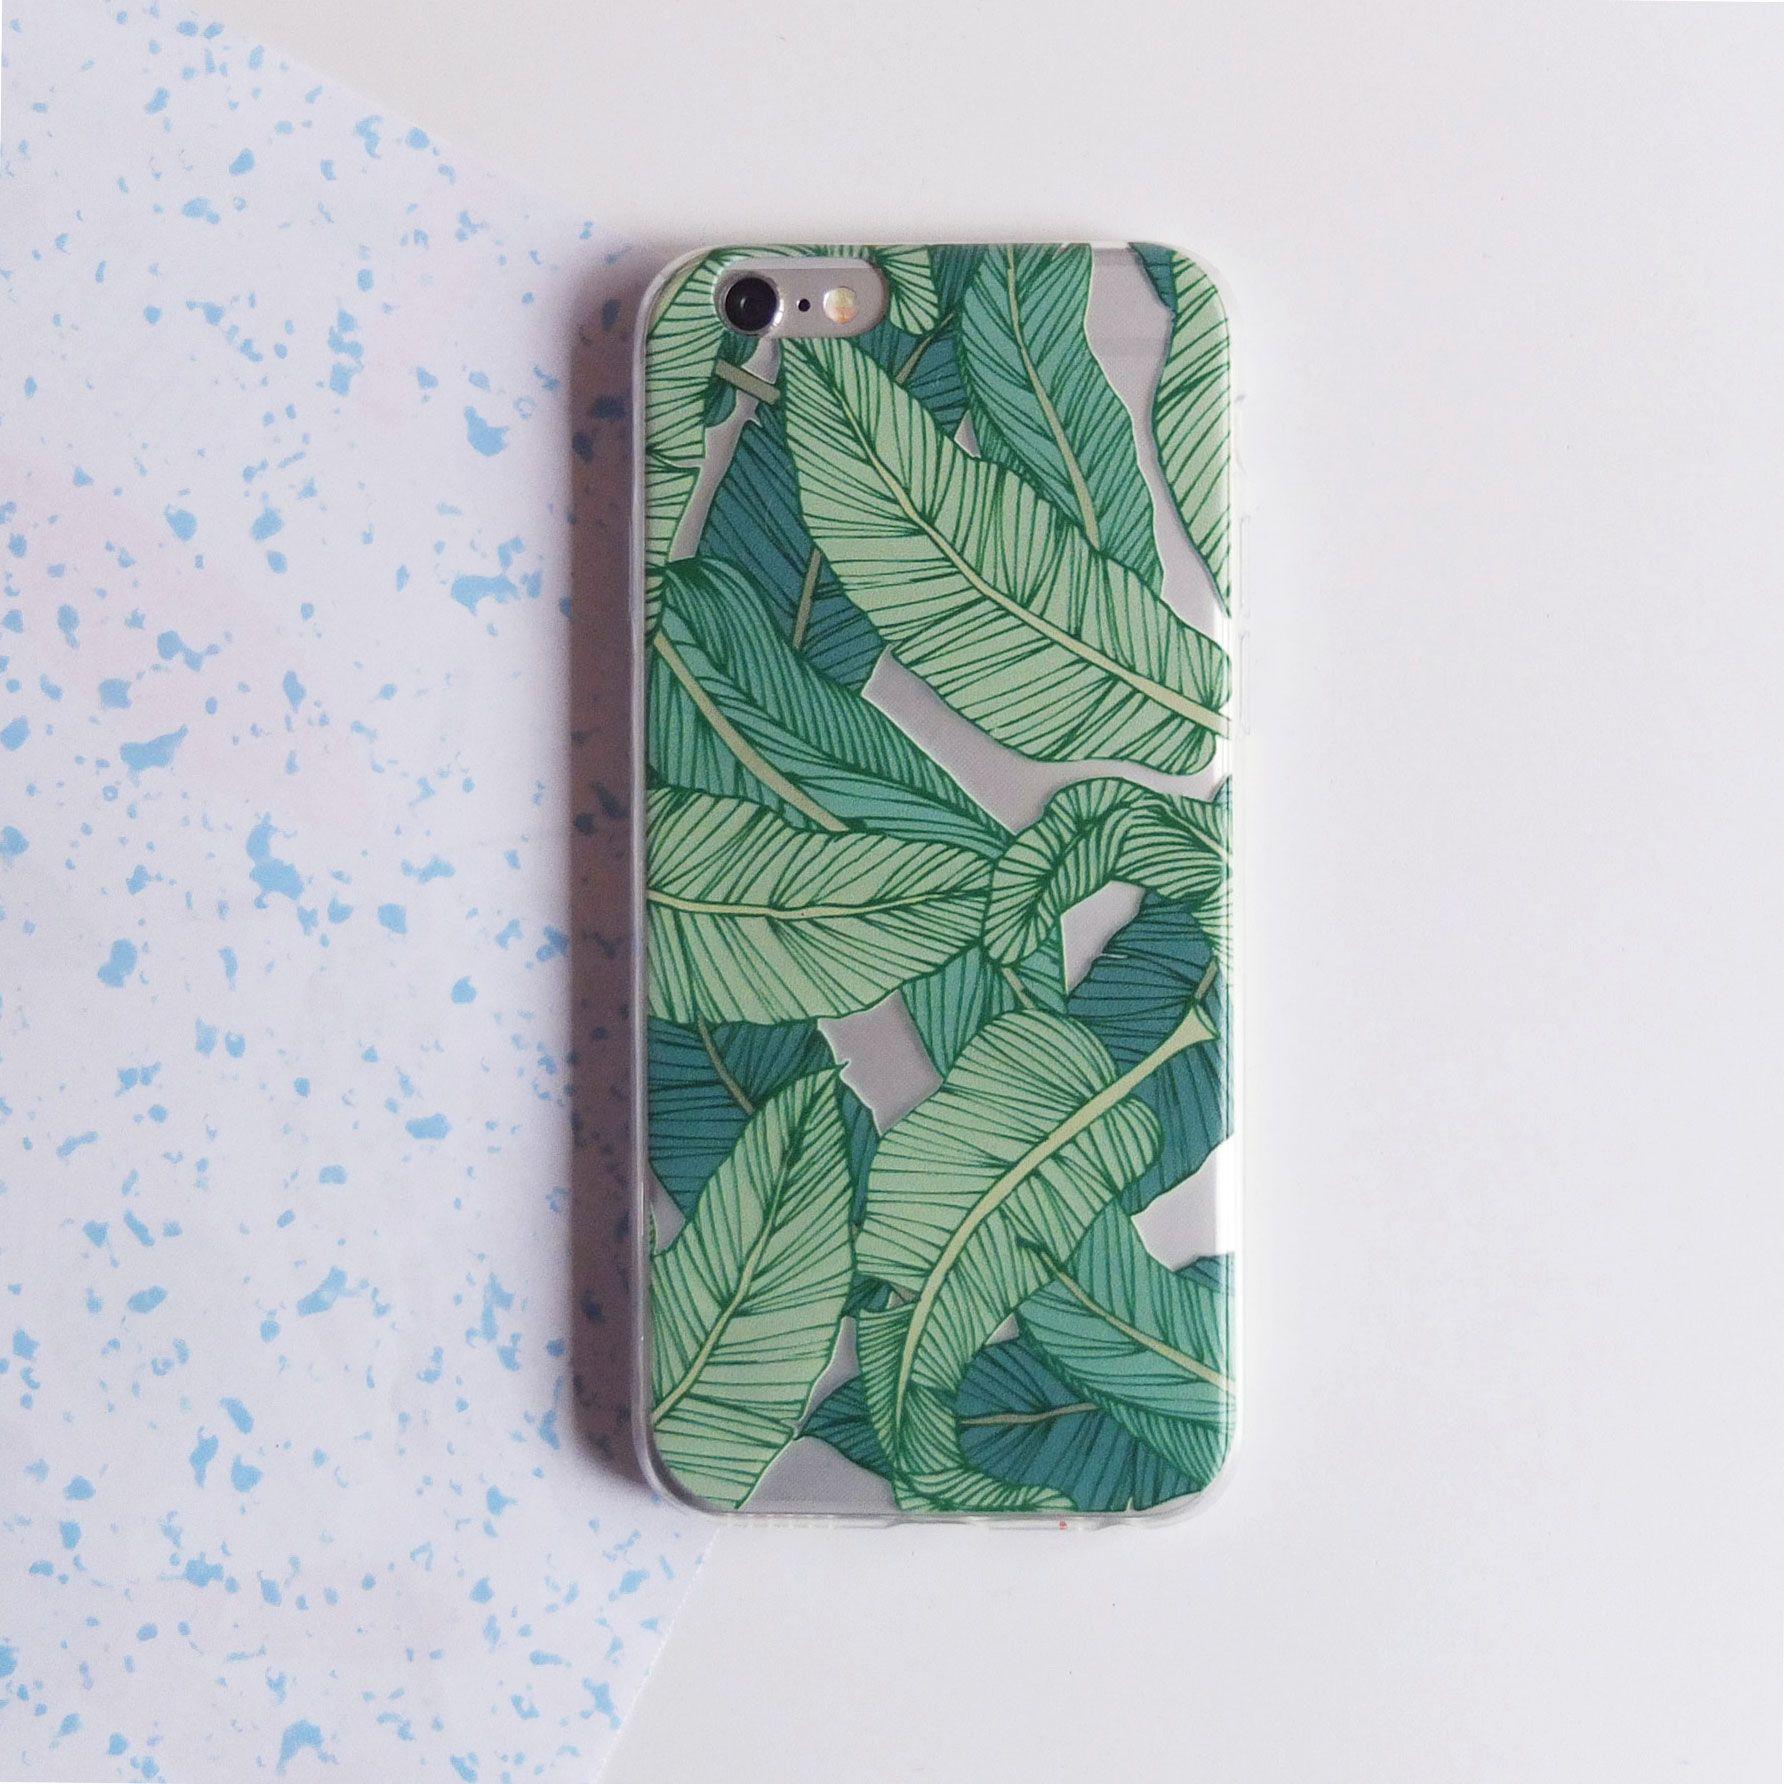 d5d4f56be97 Carcasa iPhone 6/6s Selva | Styles | Carcasa iphone, Iphone y iPhone 6